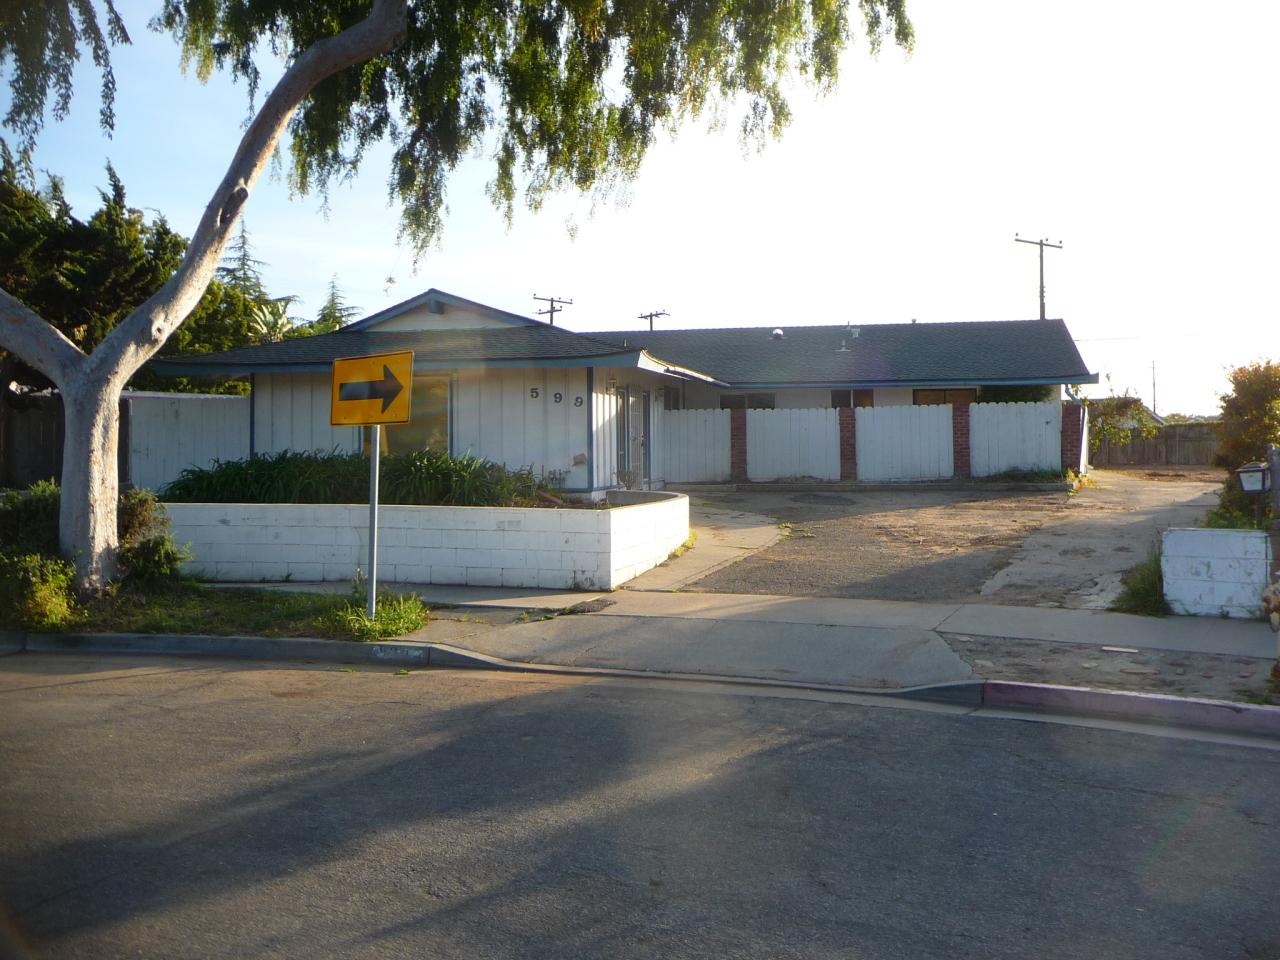 Property photo for 599 Via El Cuadro Santa Barbara, California 93111 - 12-1259